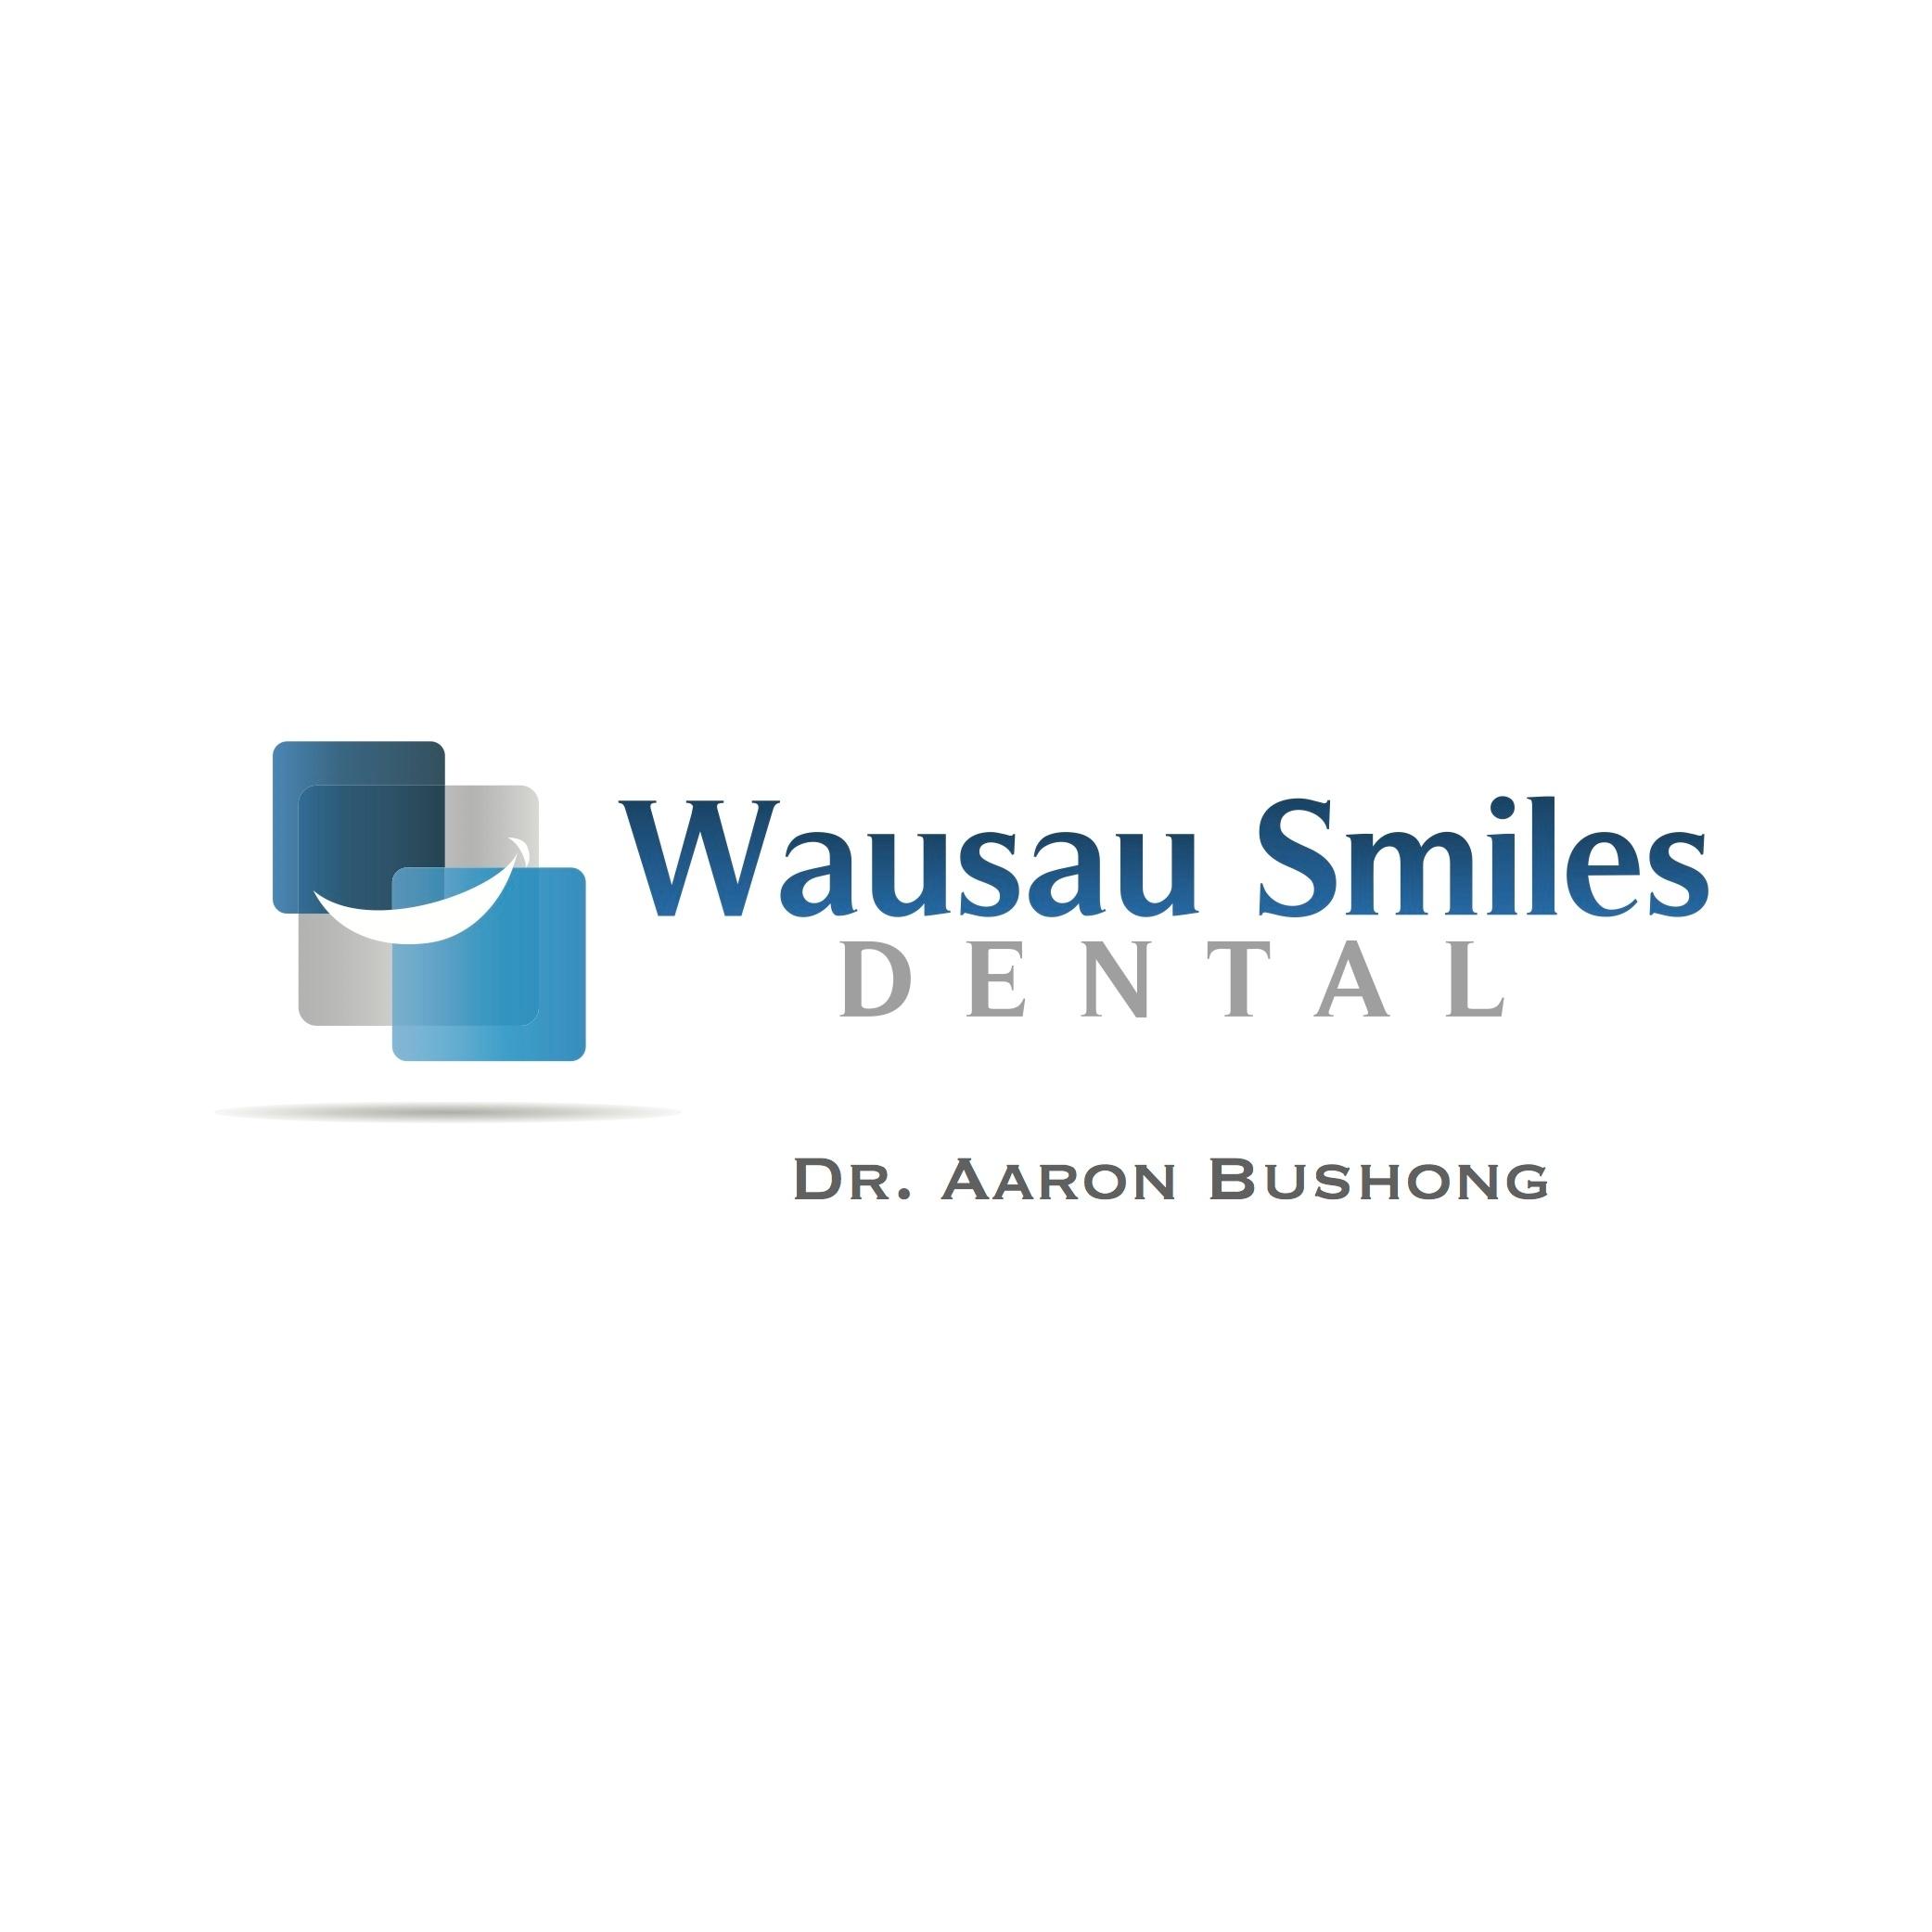 Wausau Smiles